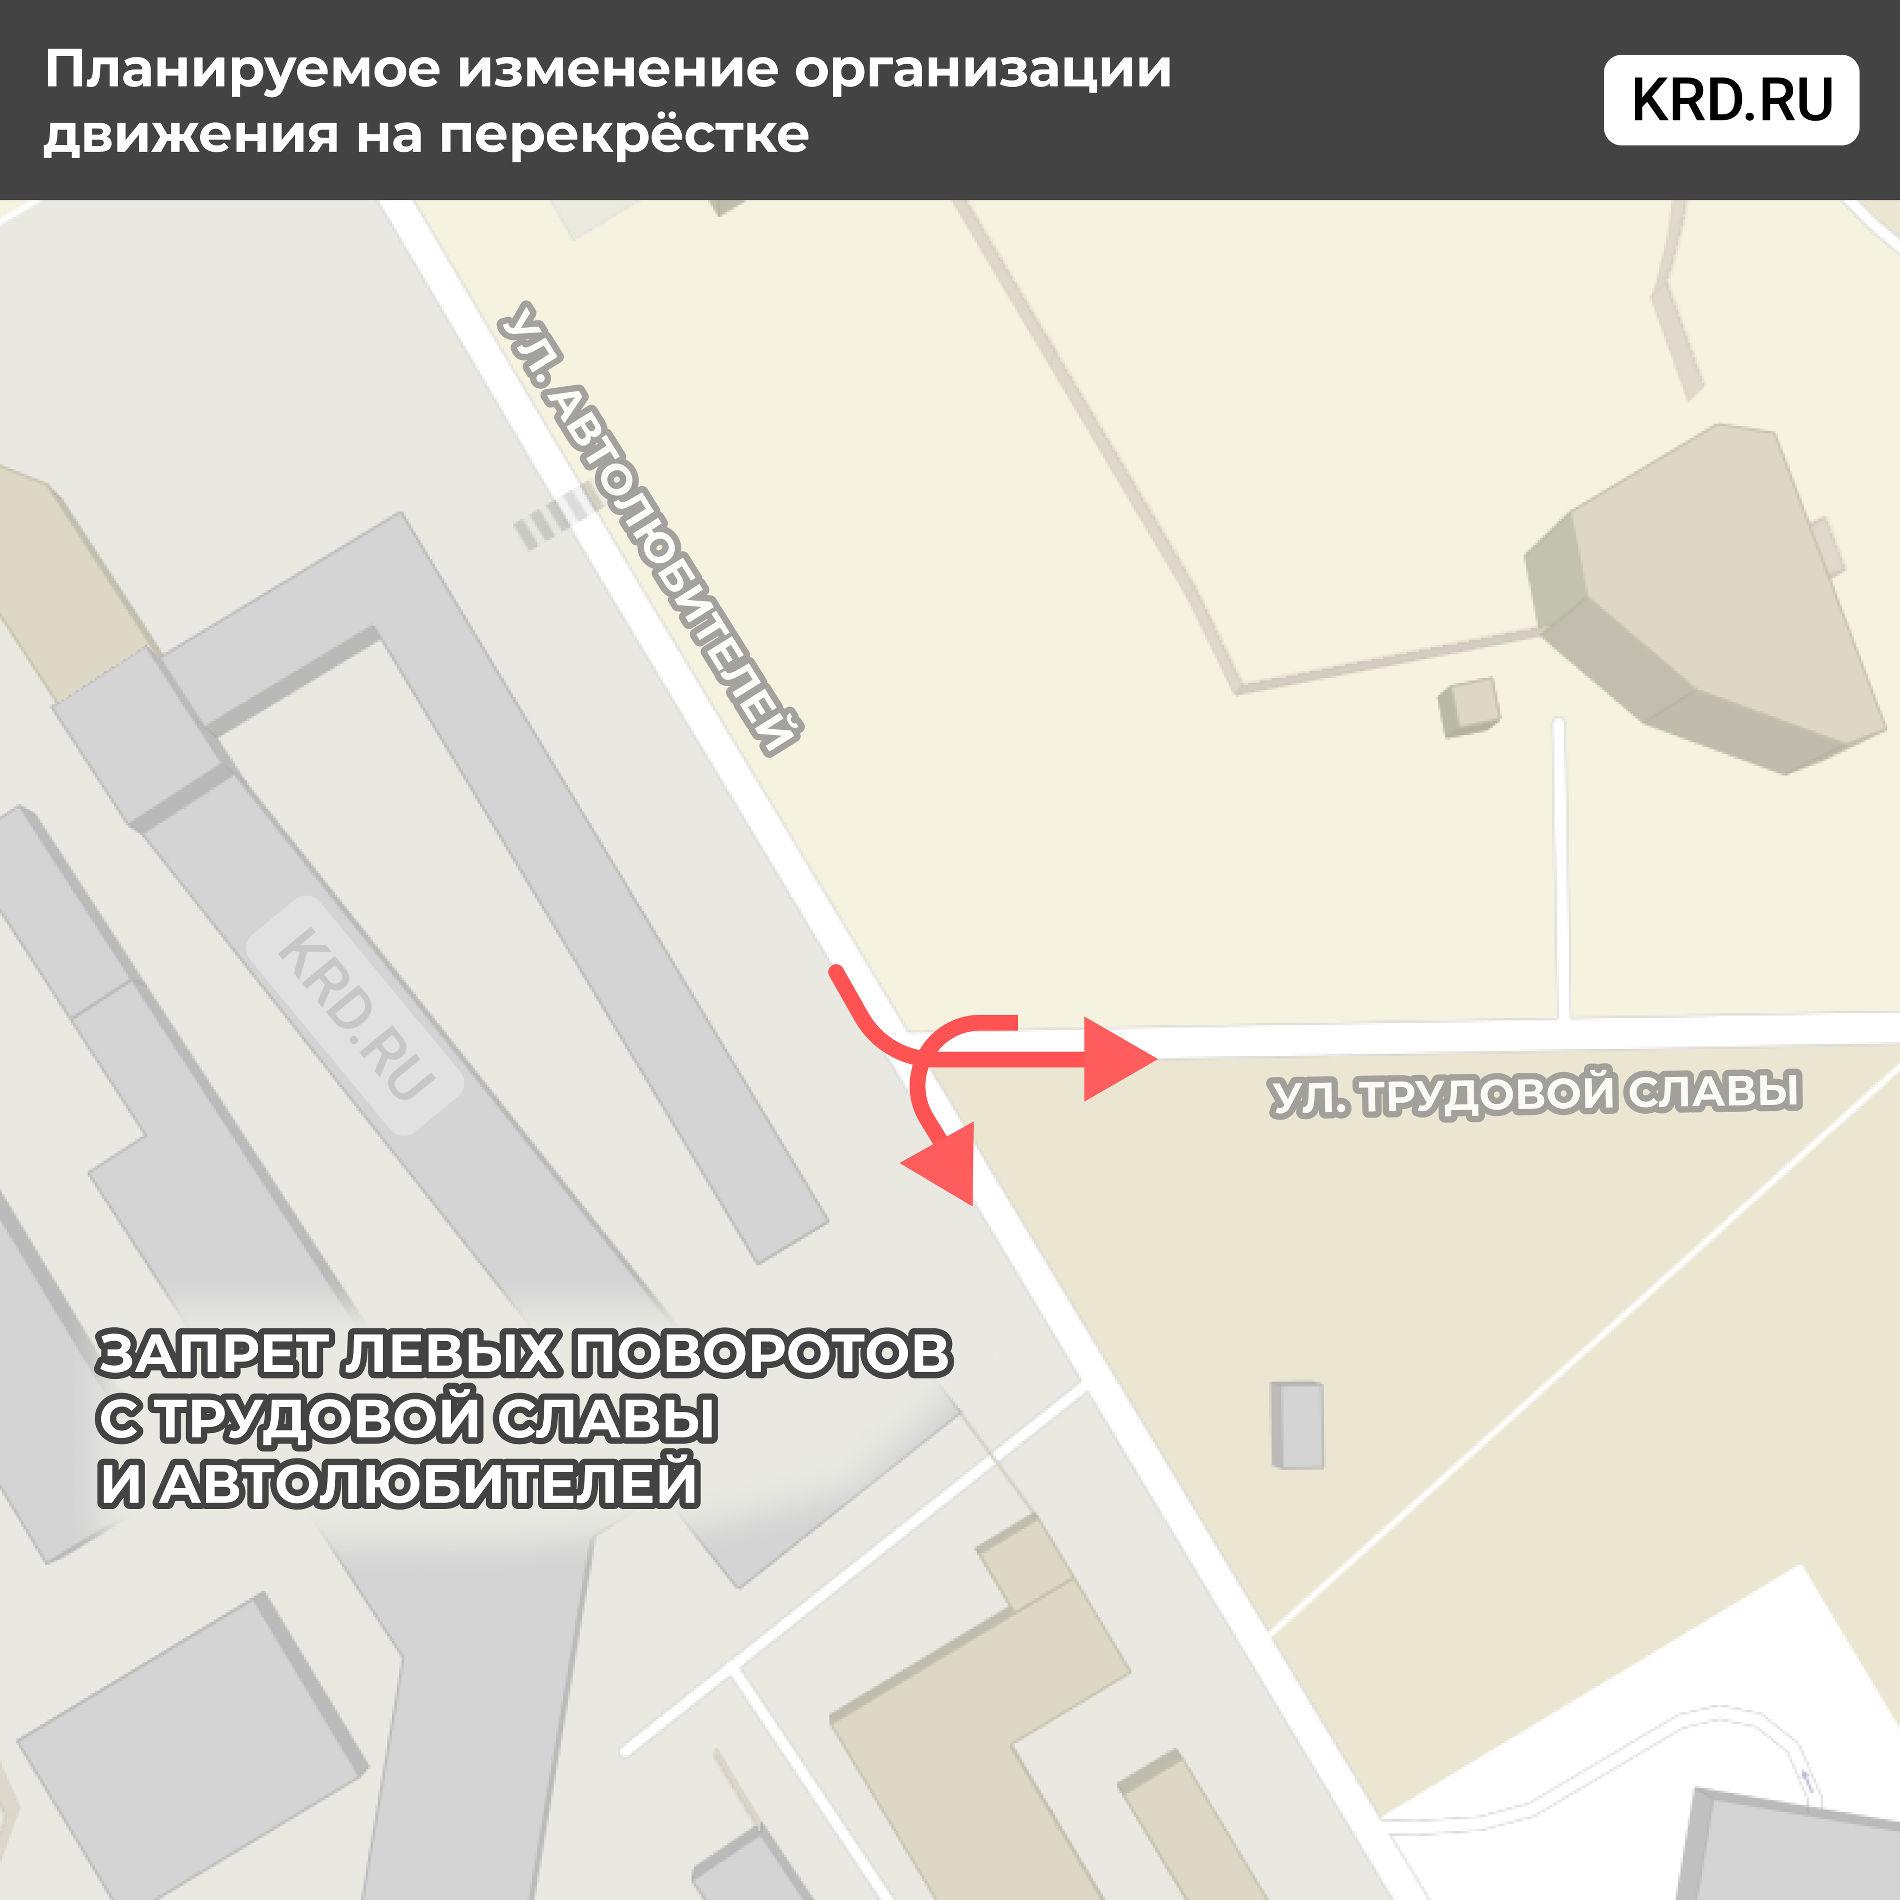 ©Инфографика пресс-службы мэрии Краснодара